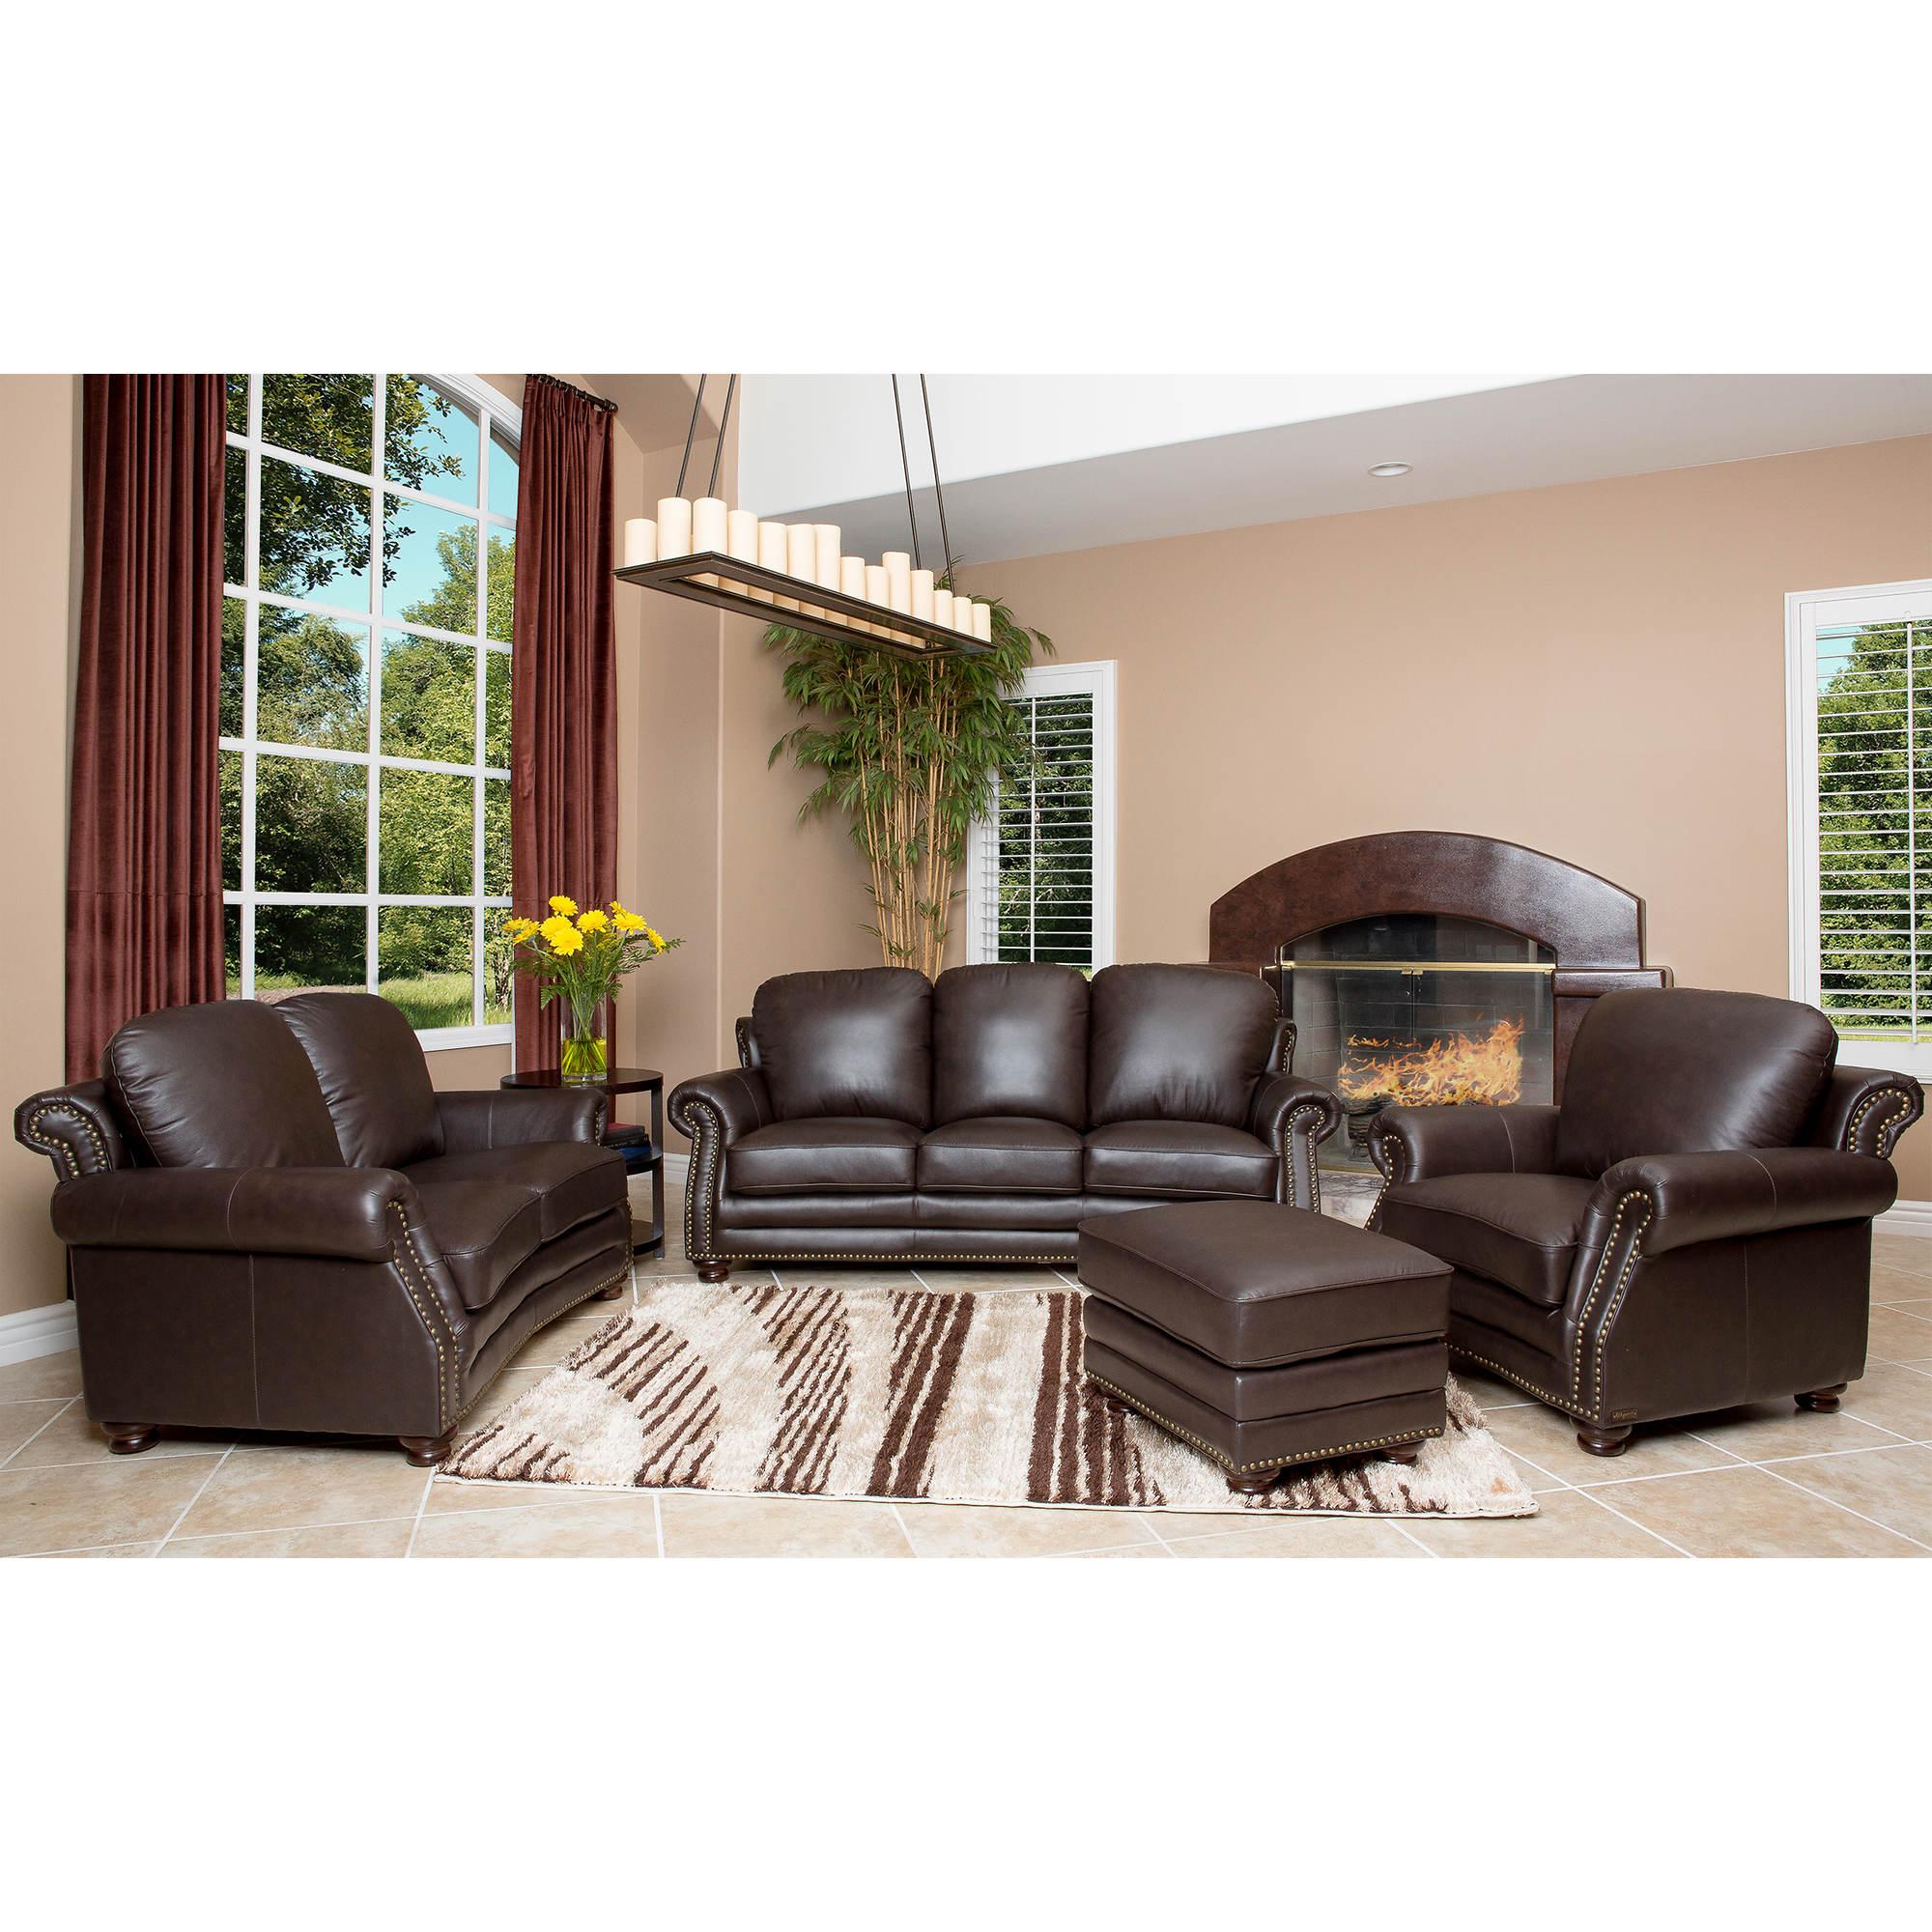 Abbyson Living Mona 4-Pc. Leather Living Room Set